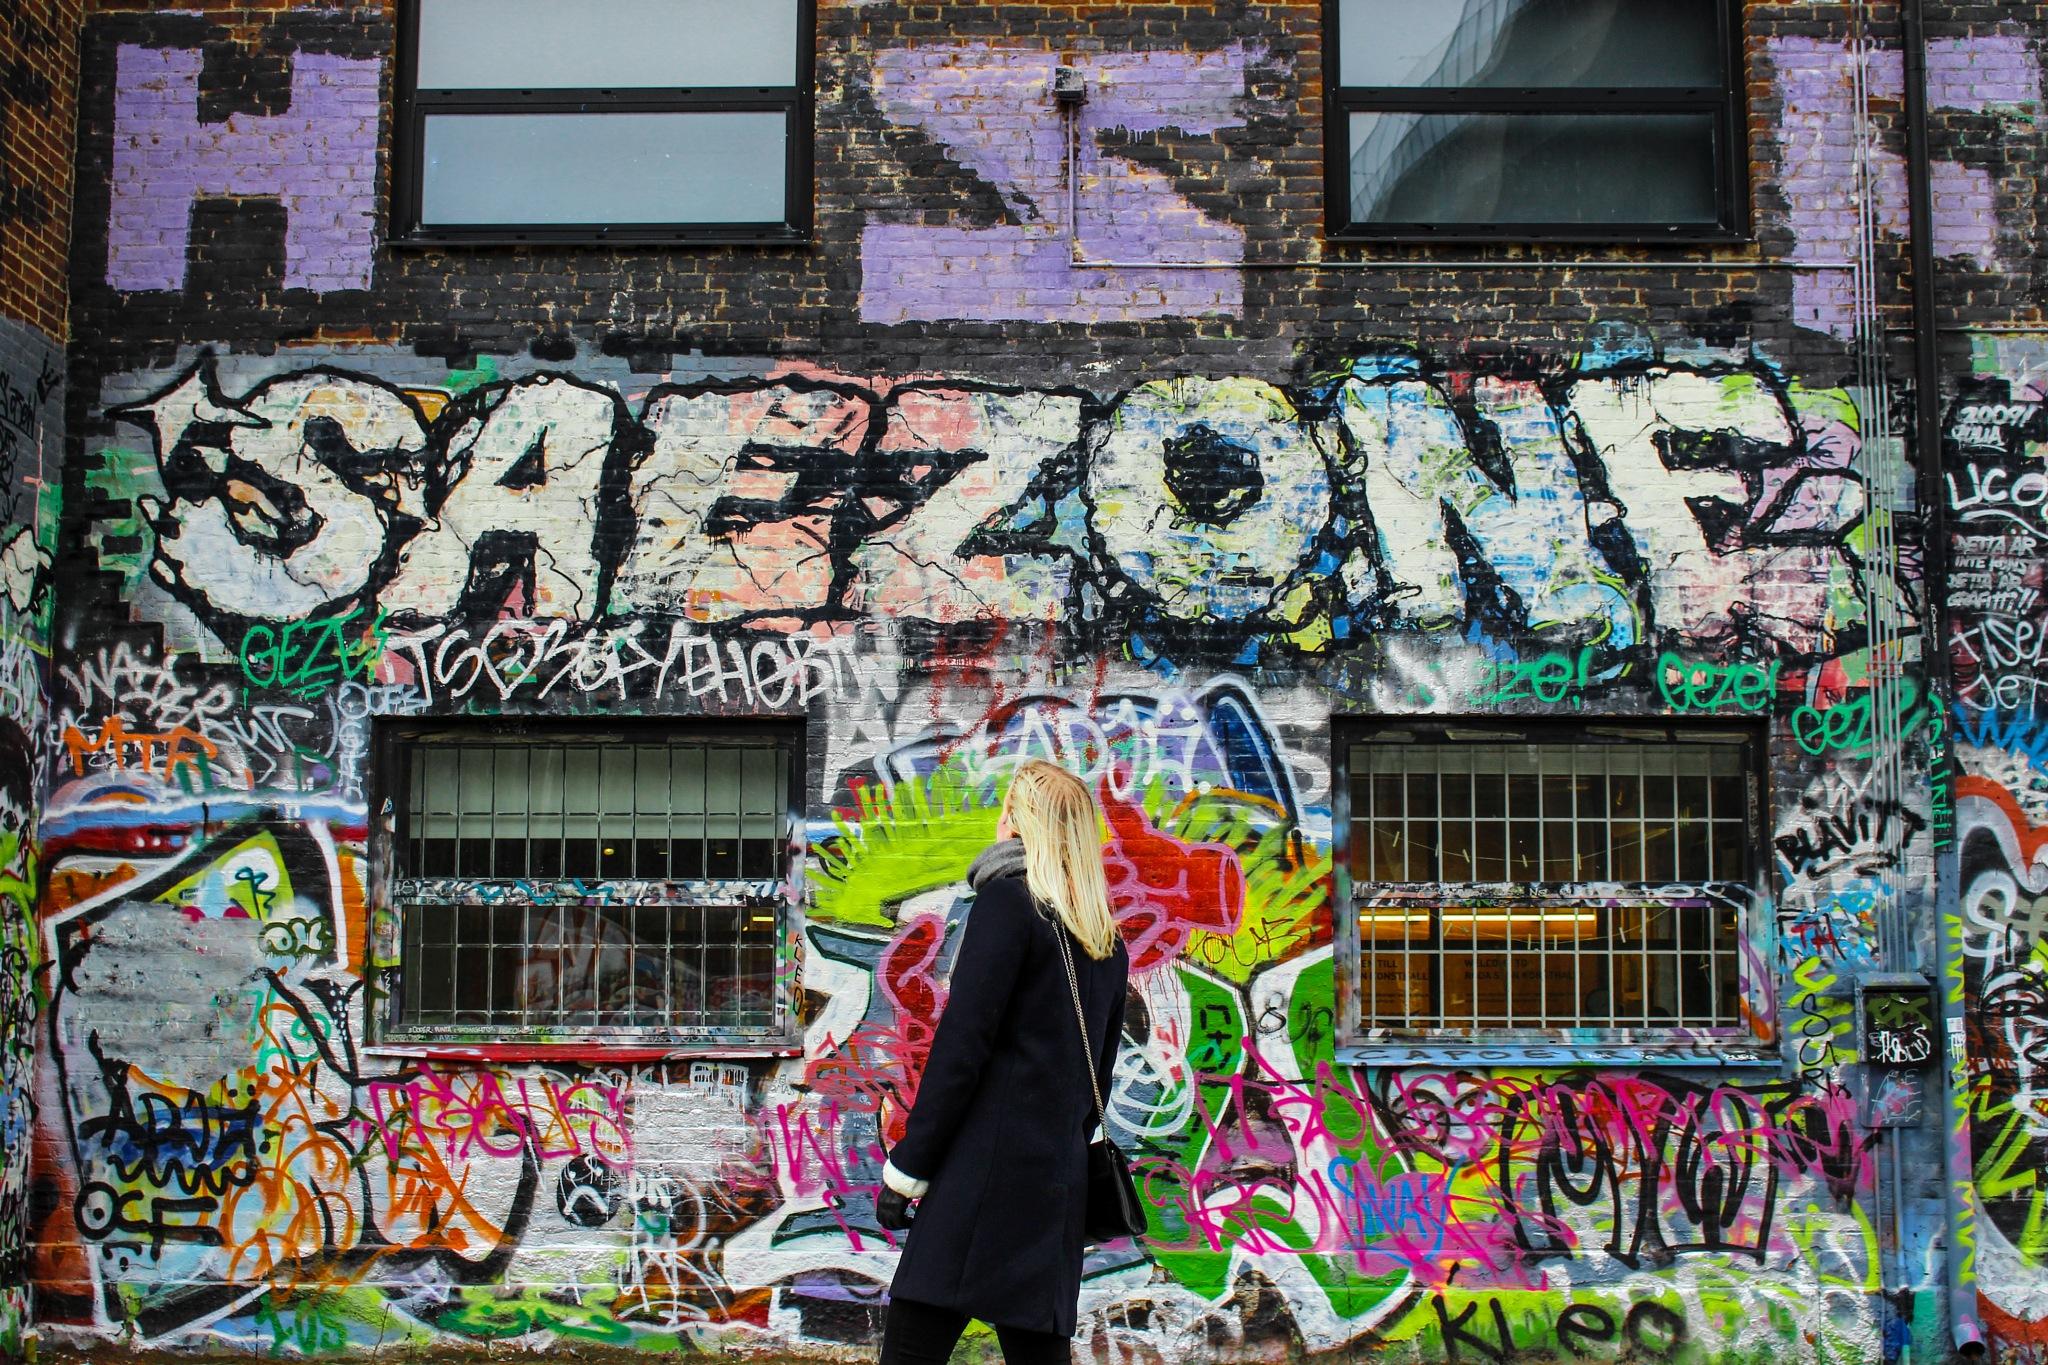 Saezone or safezone by JesperGrenander